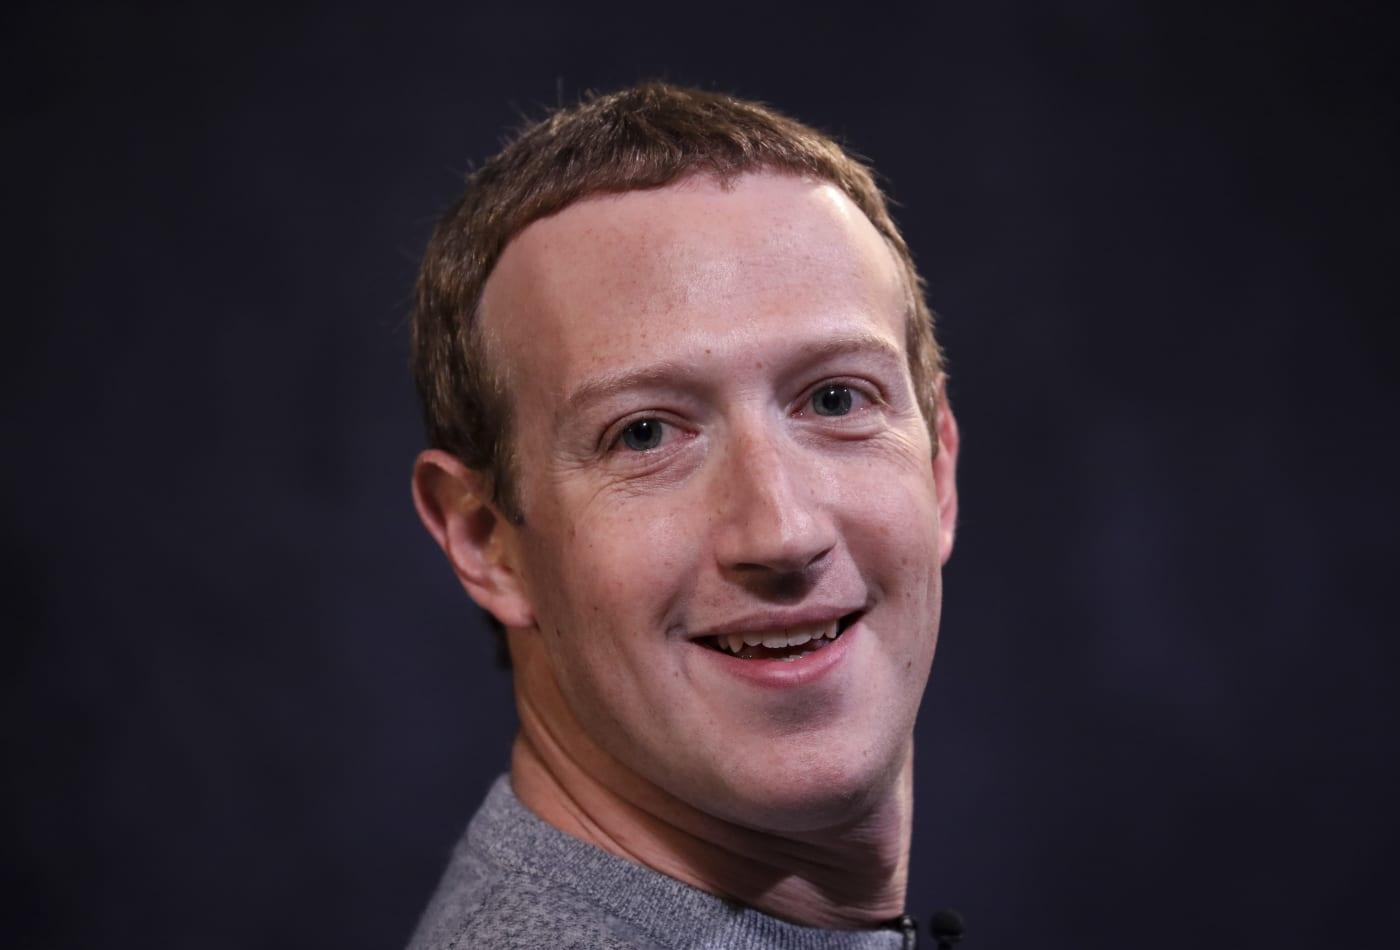 Mark Zuckerberg: I need downtime 'where I'm not 'Mark Zuckerberg'